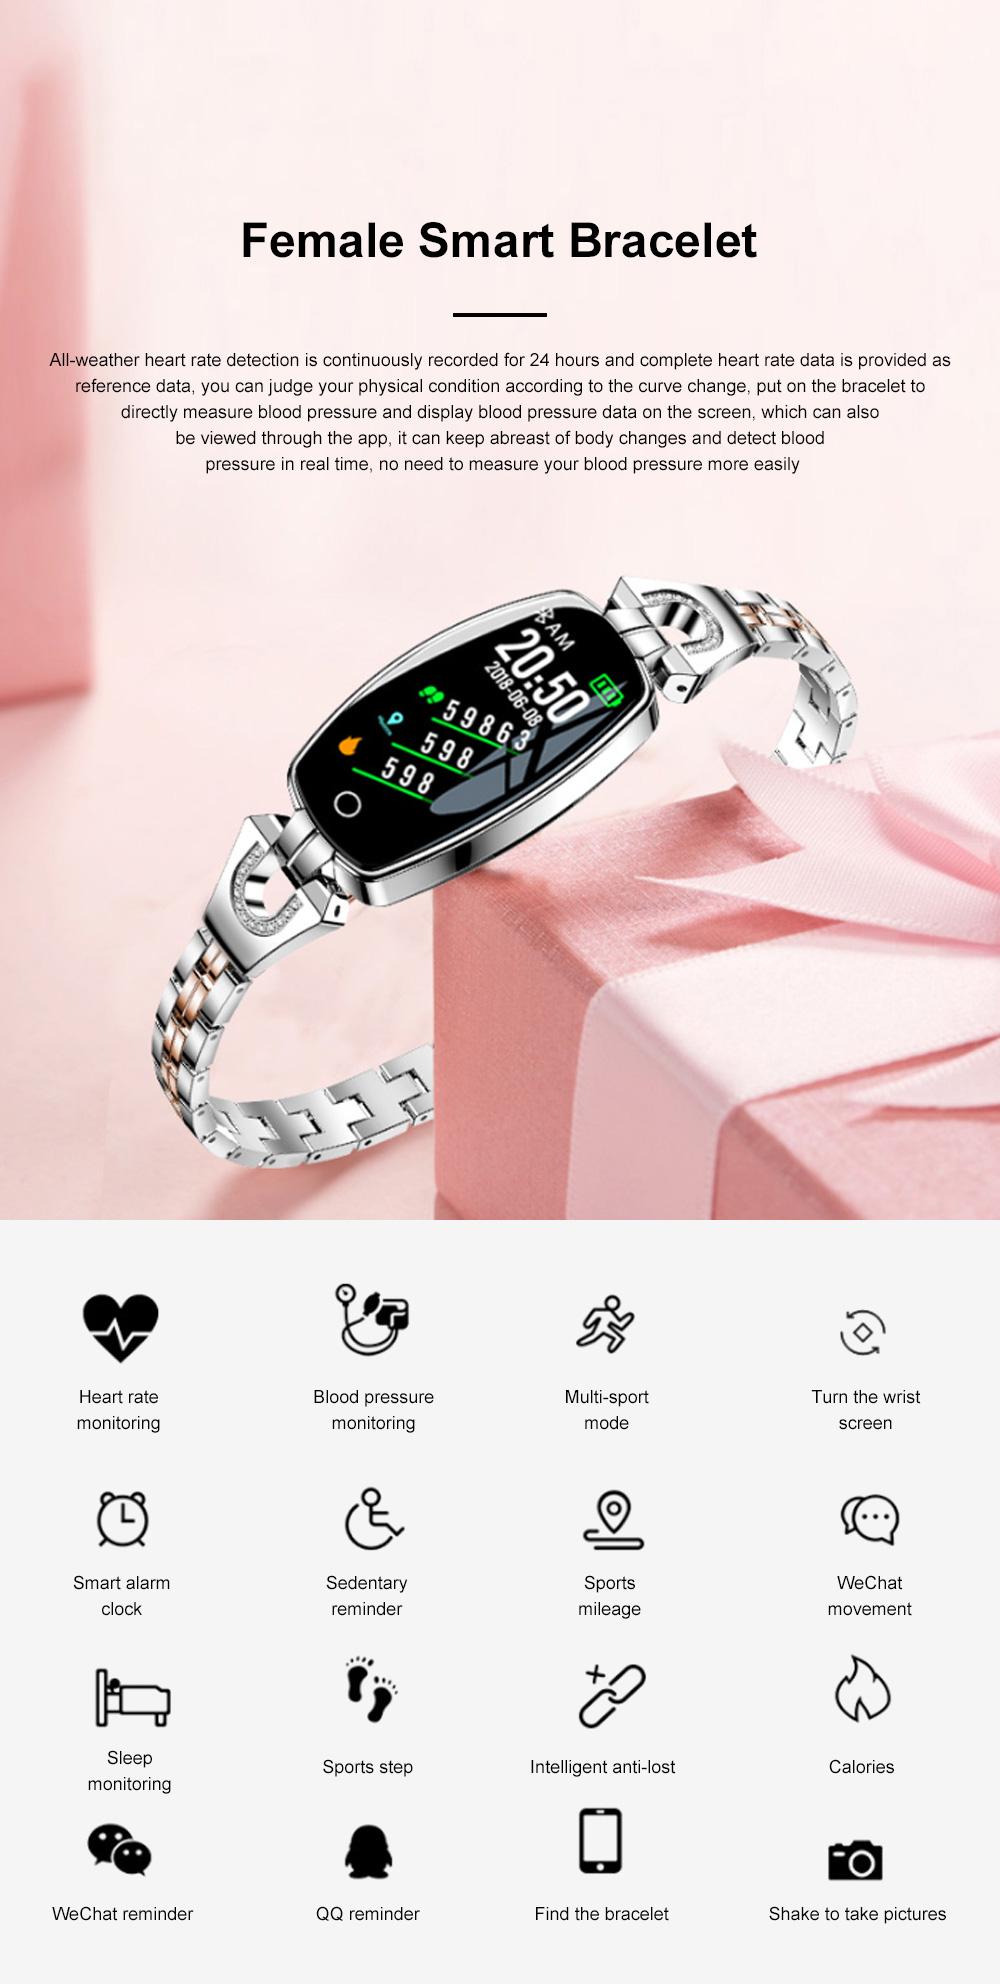 2019 Women Lady Fashion Smart Wristband H8 Heart Rate Blood Pressure Smart Bracelet Fitness Tracker Smart Watch Band Female Girl Gift 0